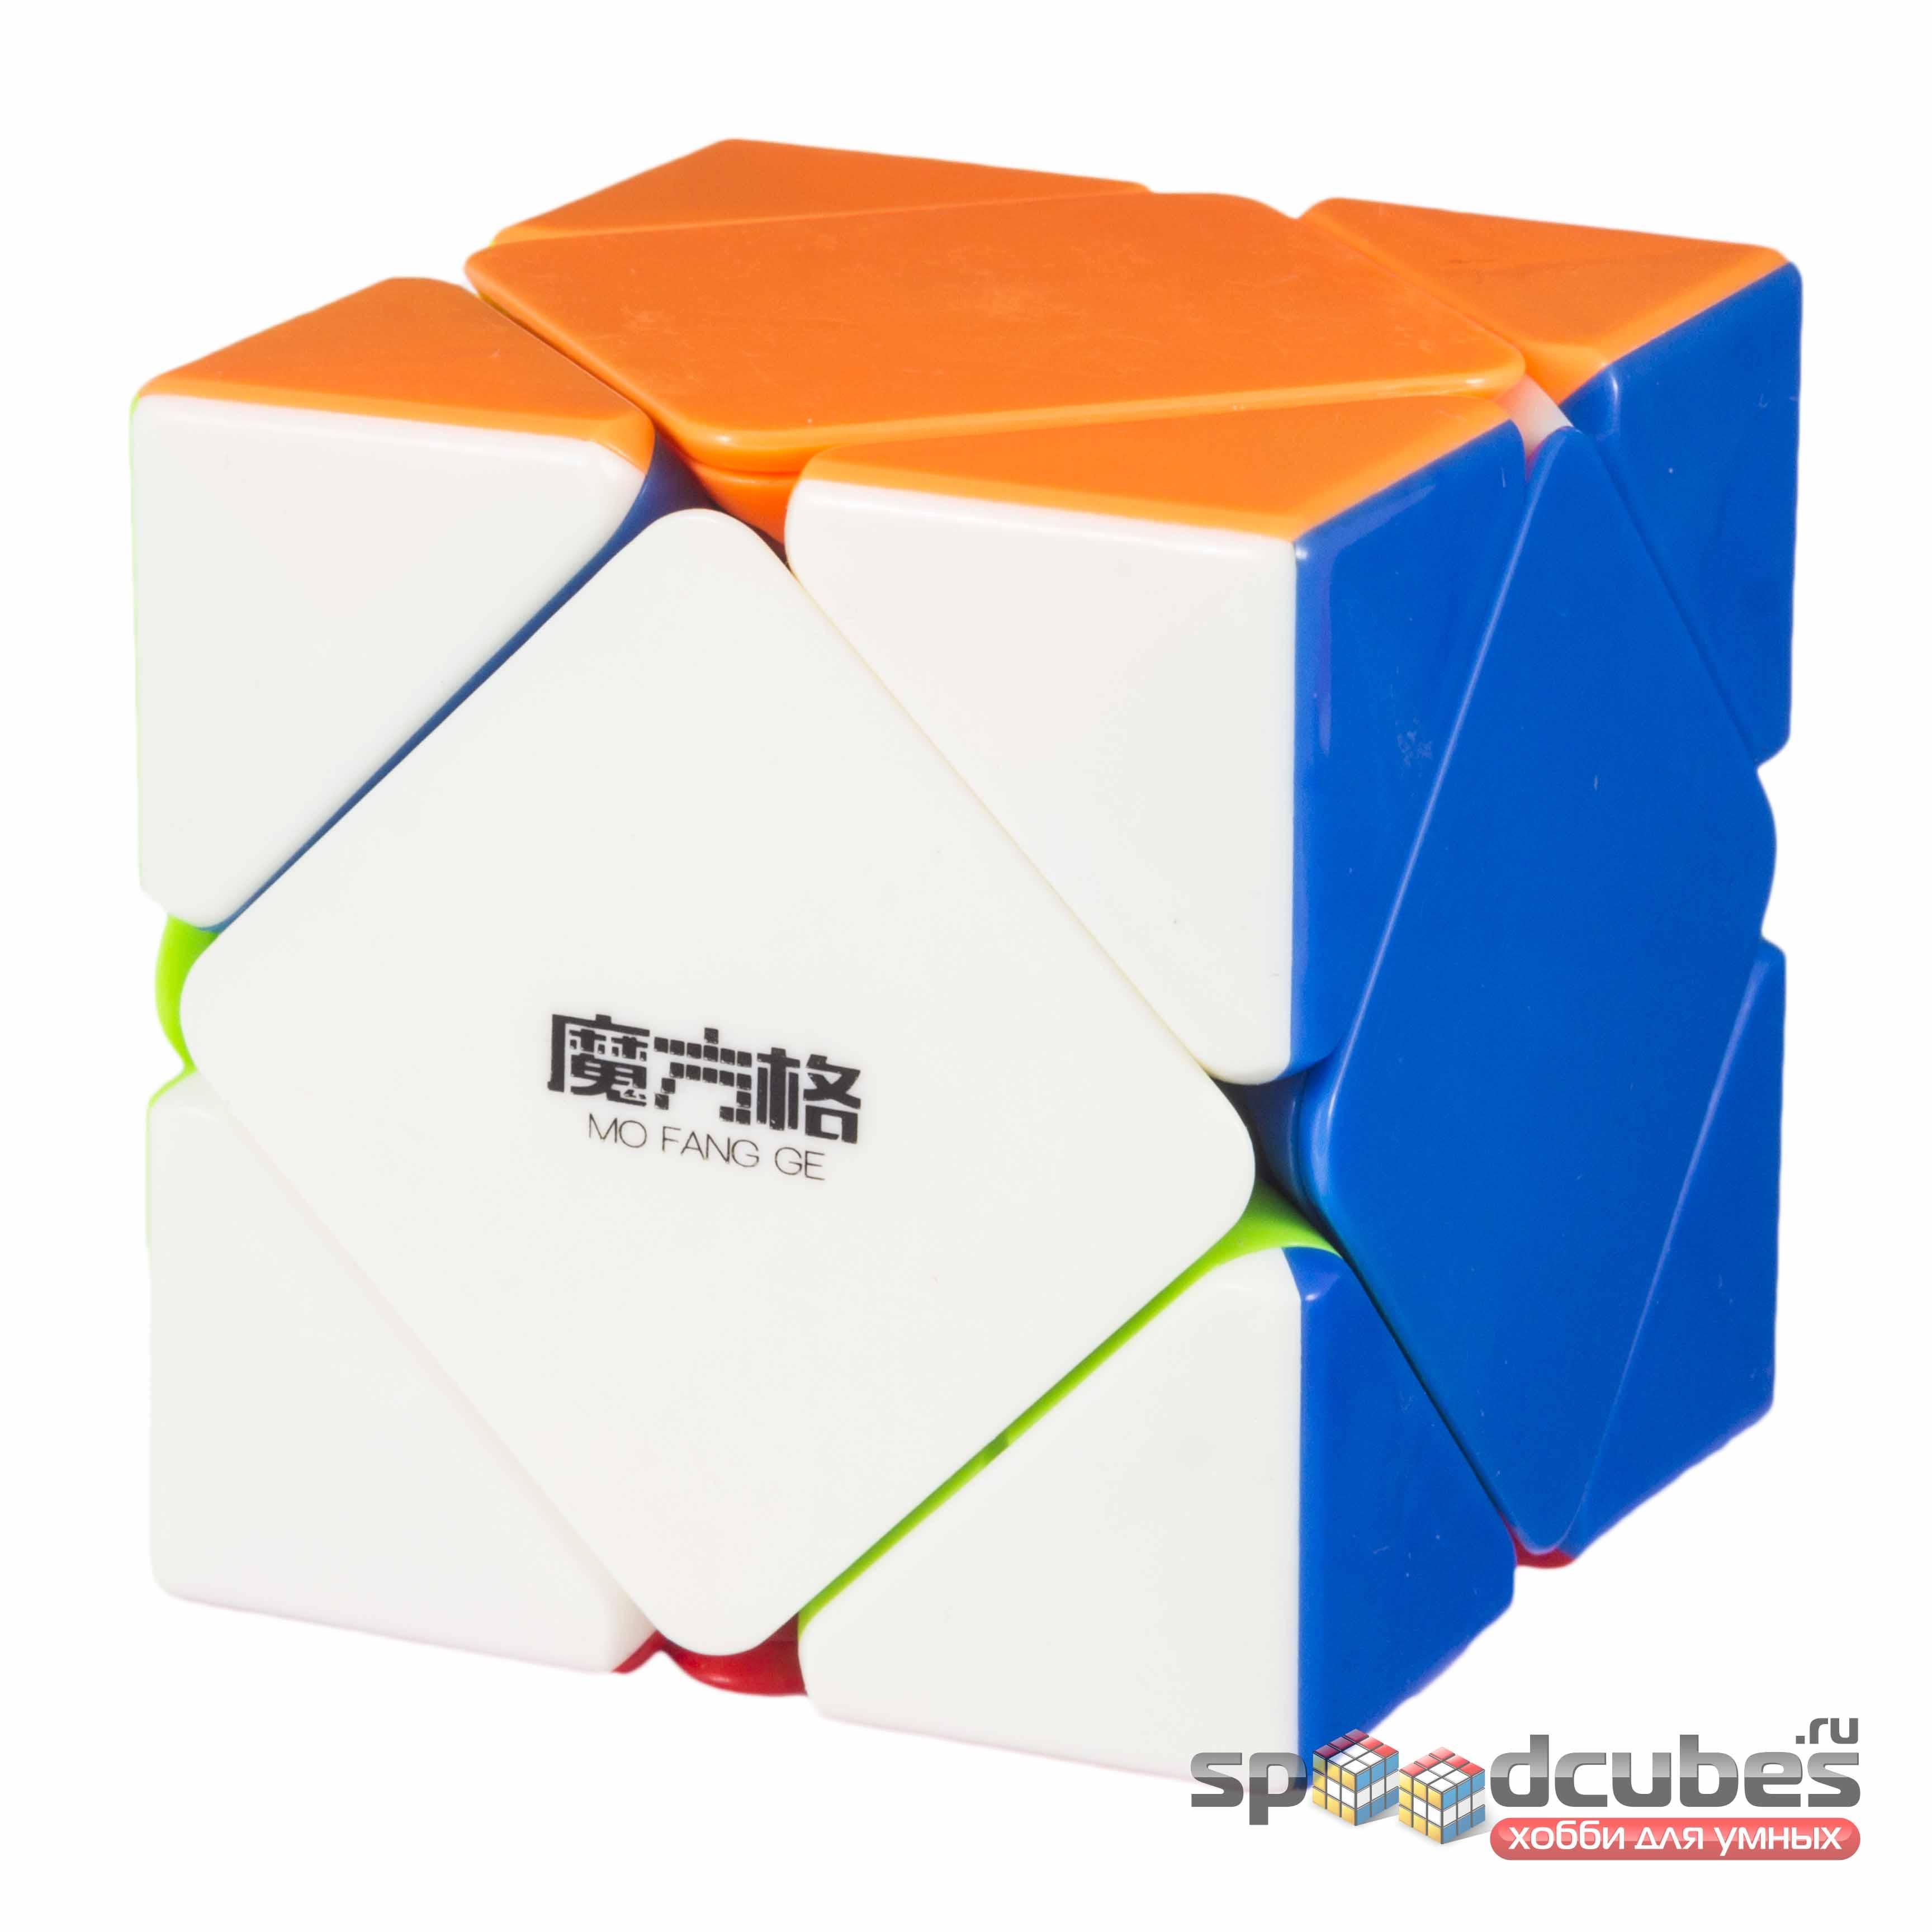 QiYi (MoFangGe) Skewb Color 2